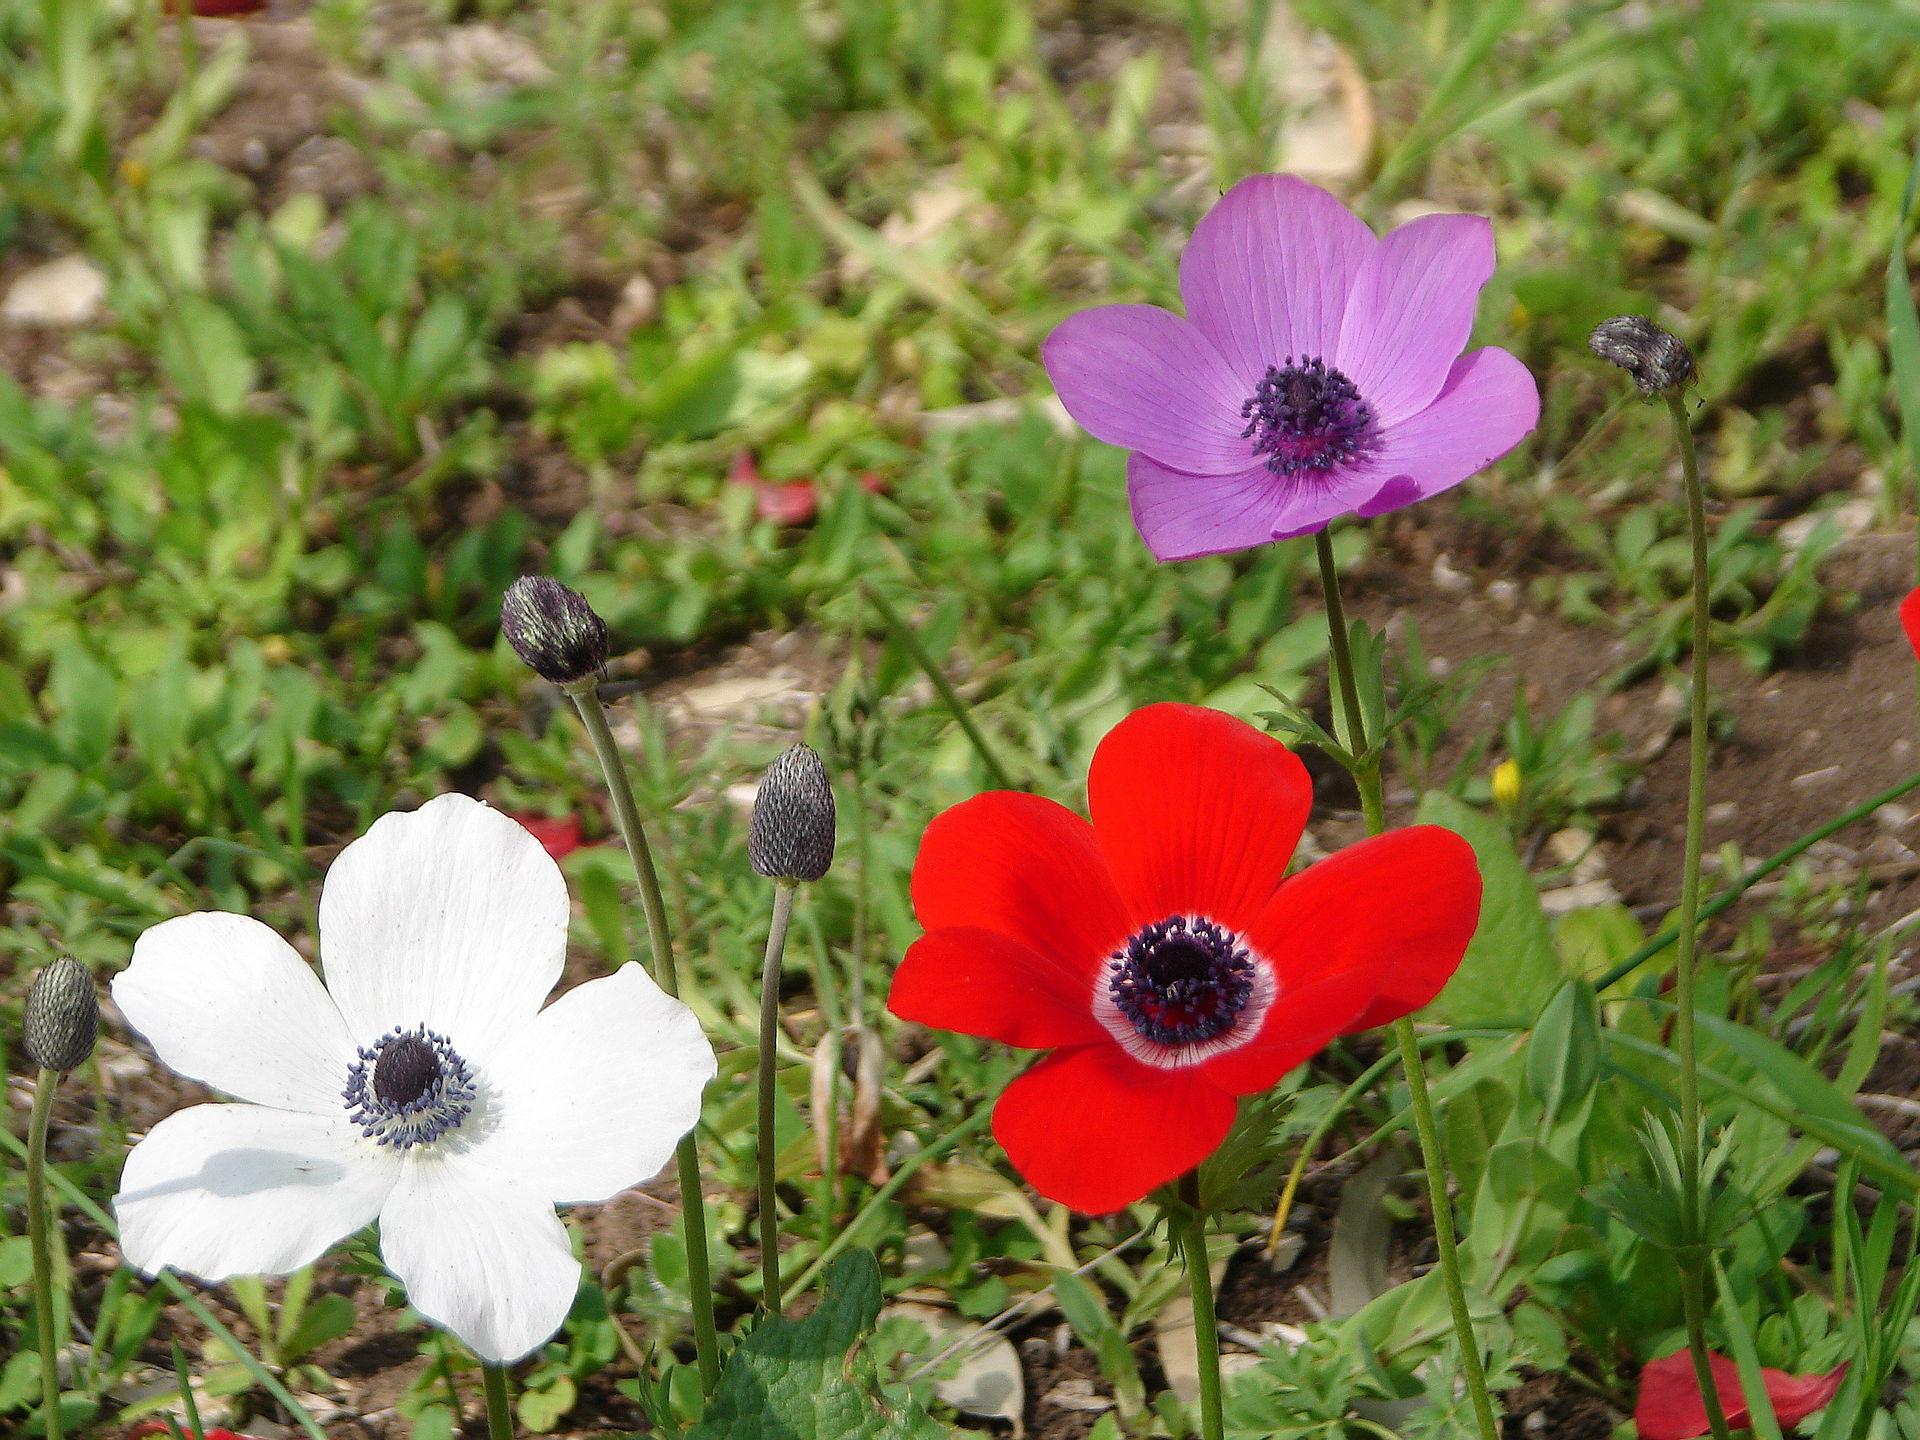 Anemone coronaria (Poppy Anemone)